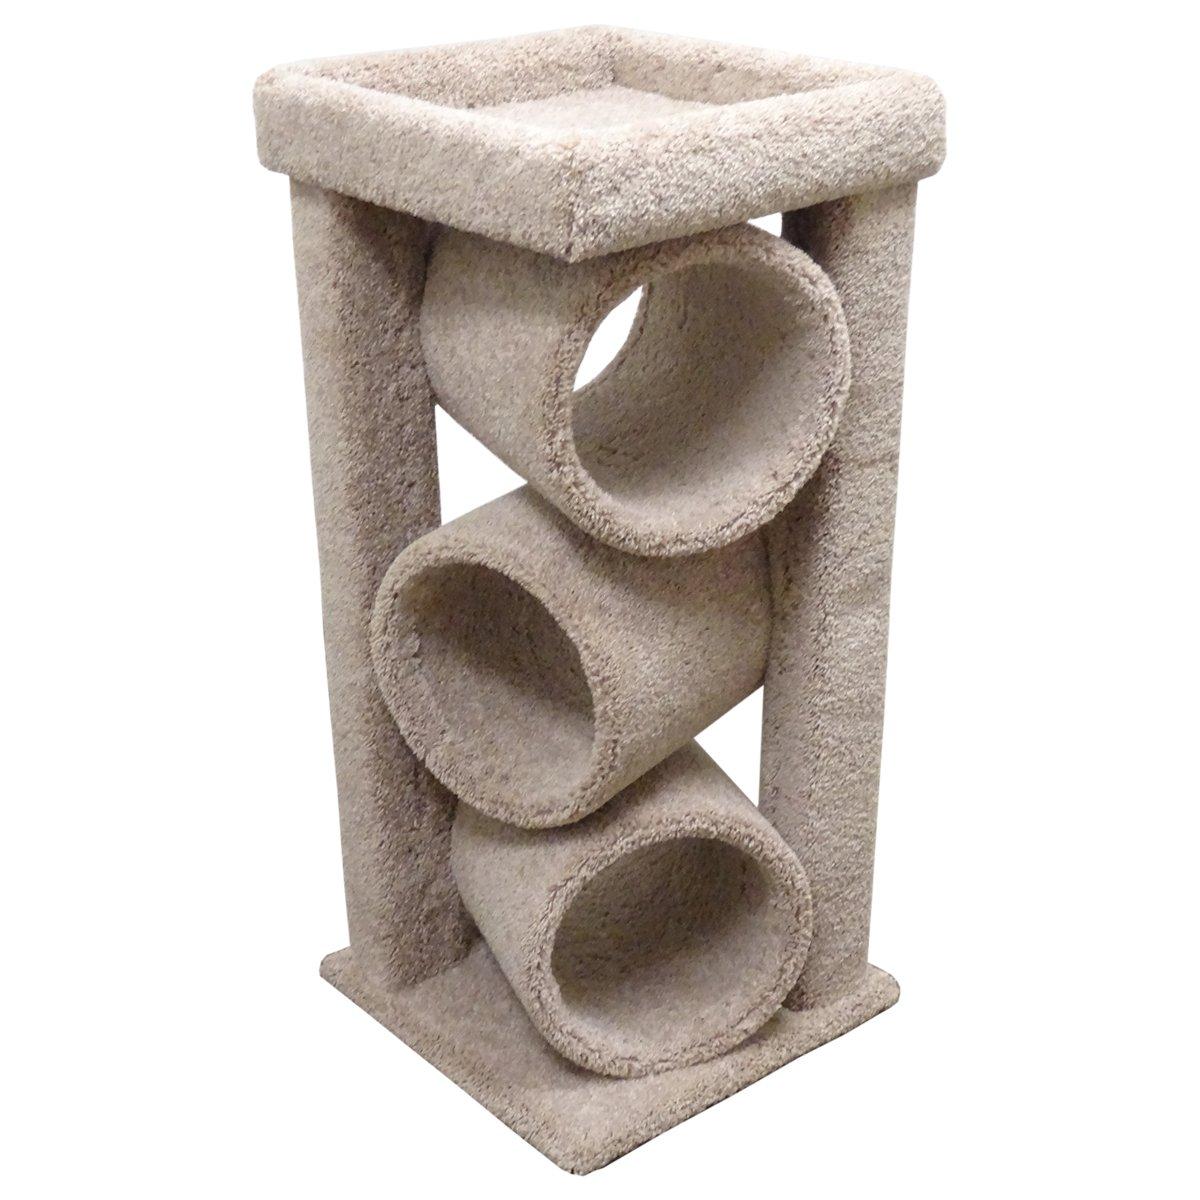 amazoncom new cat condos premier triple cat tunnel beige pet  - amazoncom new cat condos premier triple cat tunnel beige pet supplies